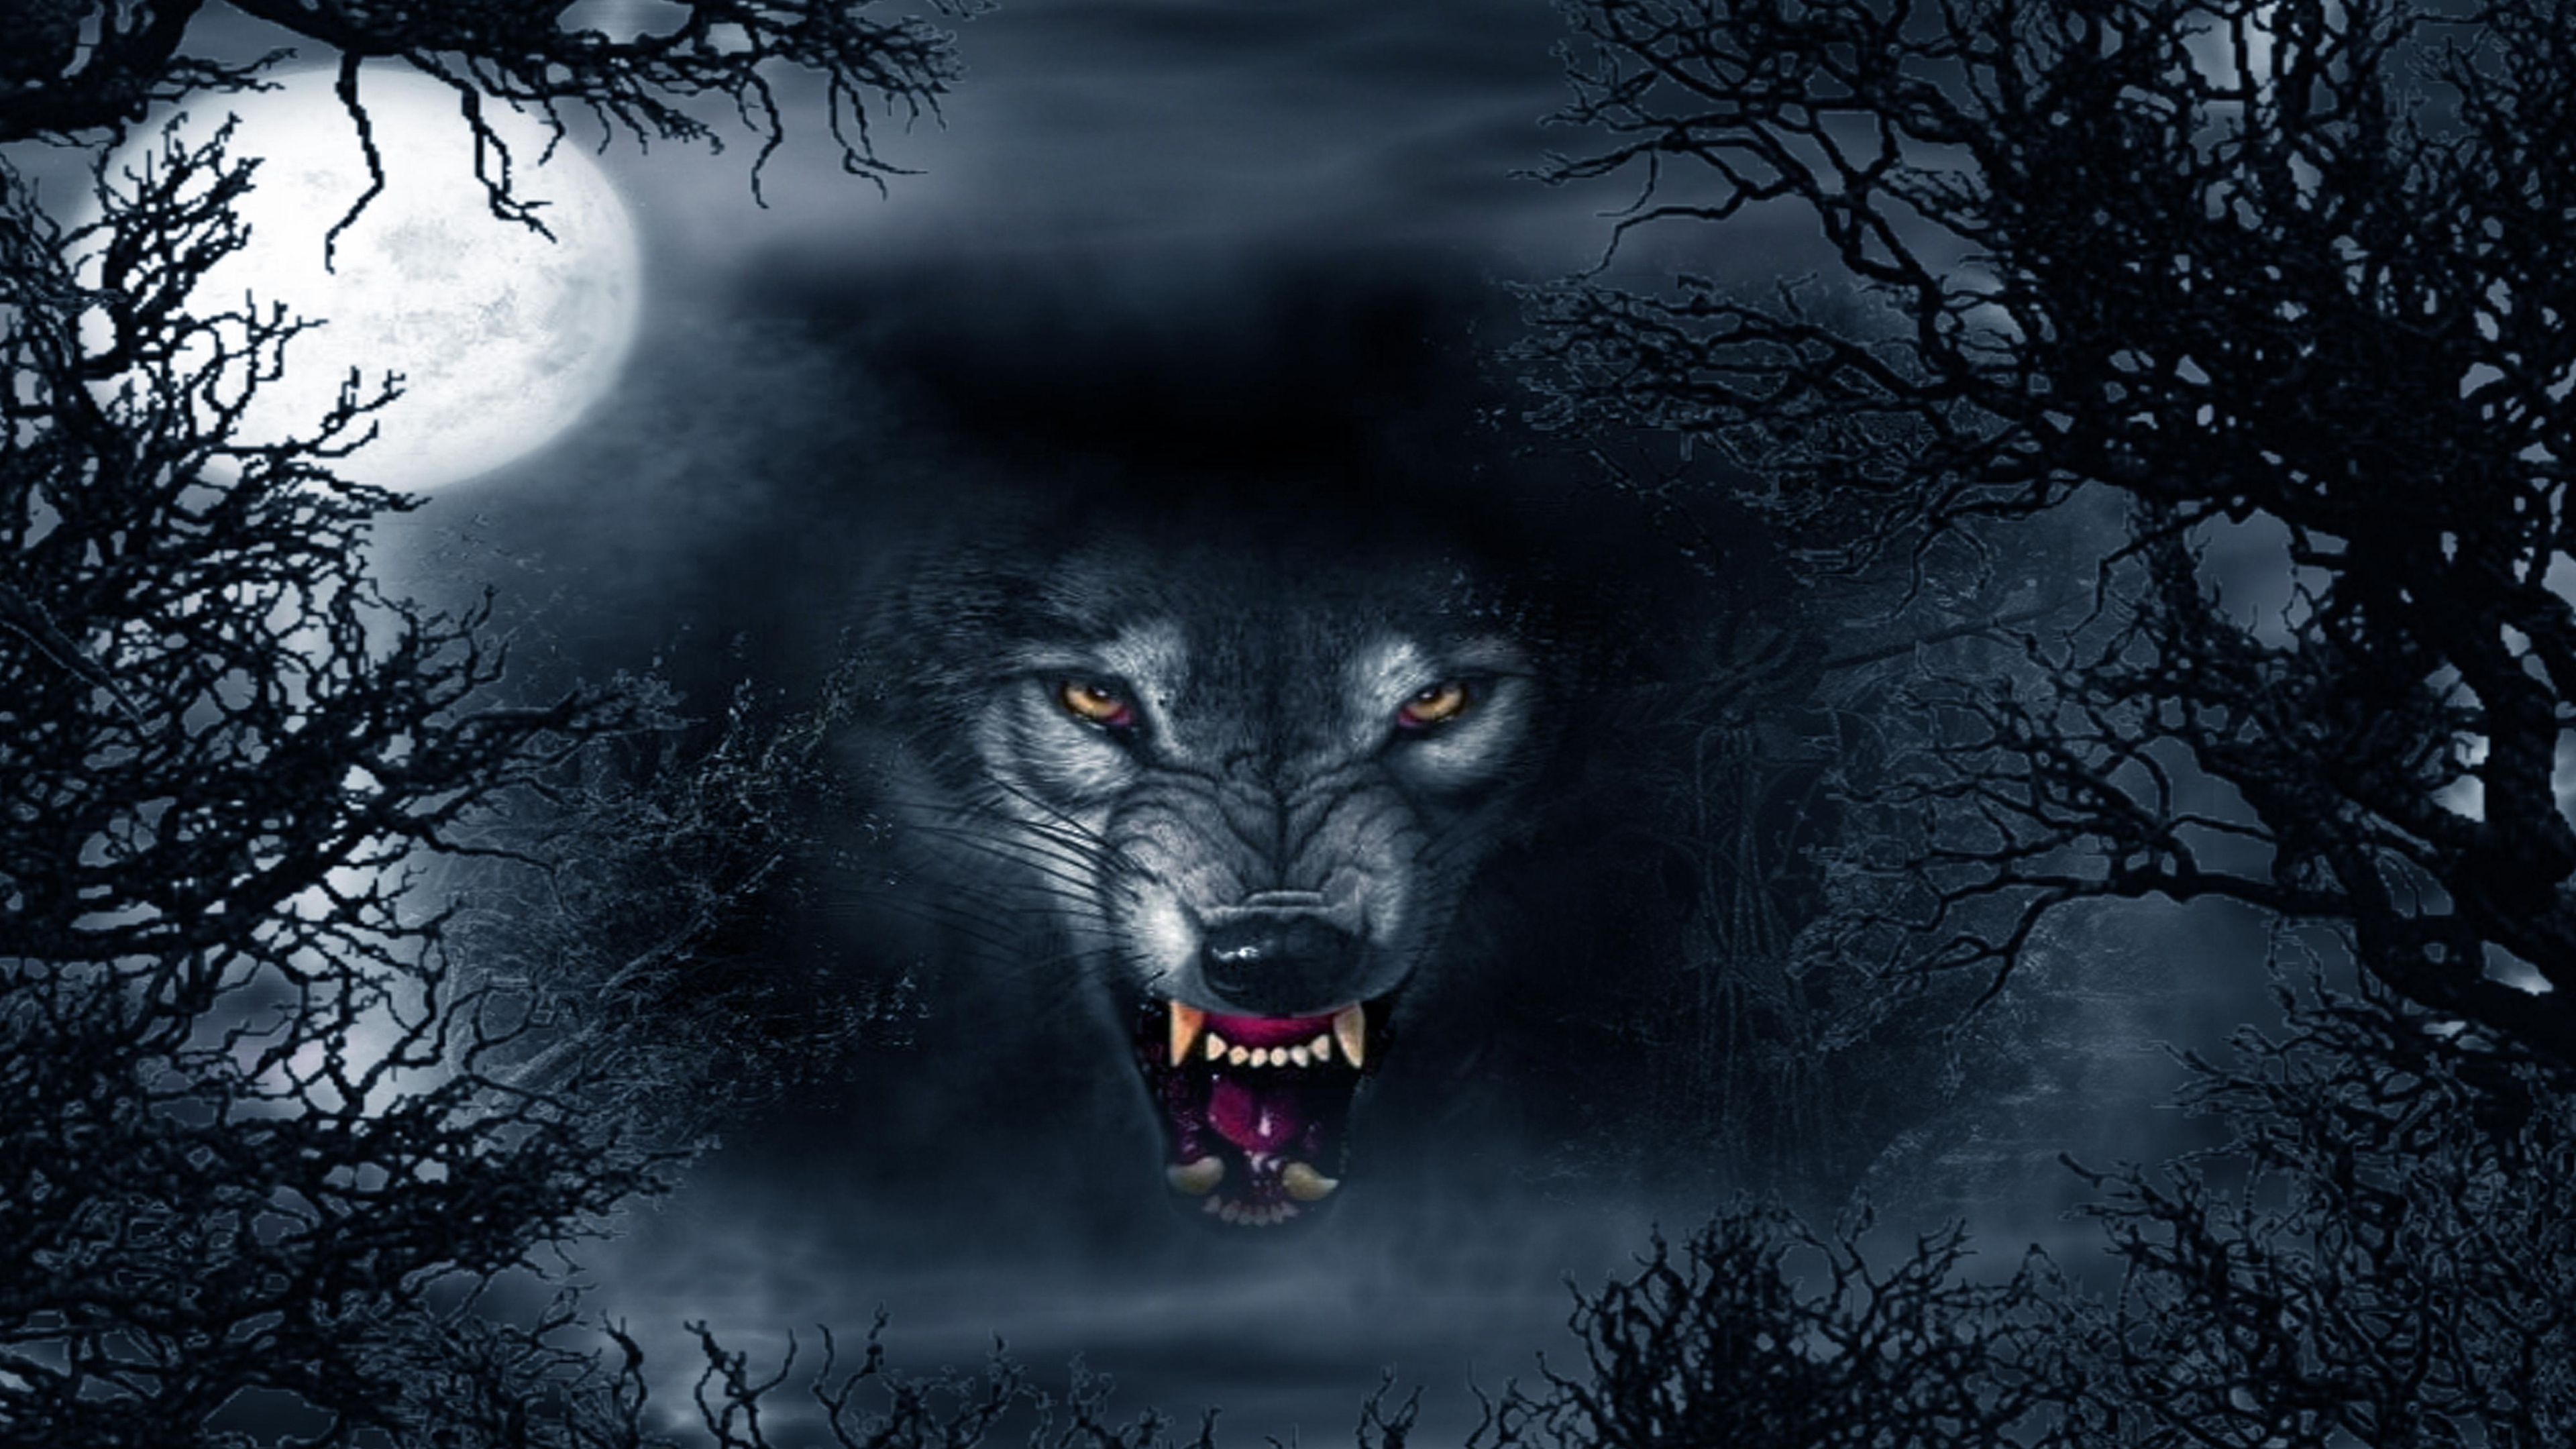 Dark Evil Wolf Wallpapers Top Free Dark Evil Wolf Backgrounds Wallpaperaccess